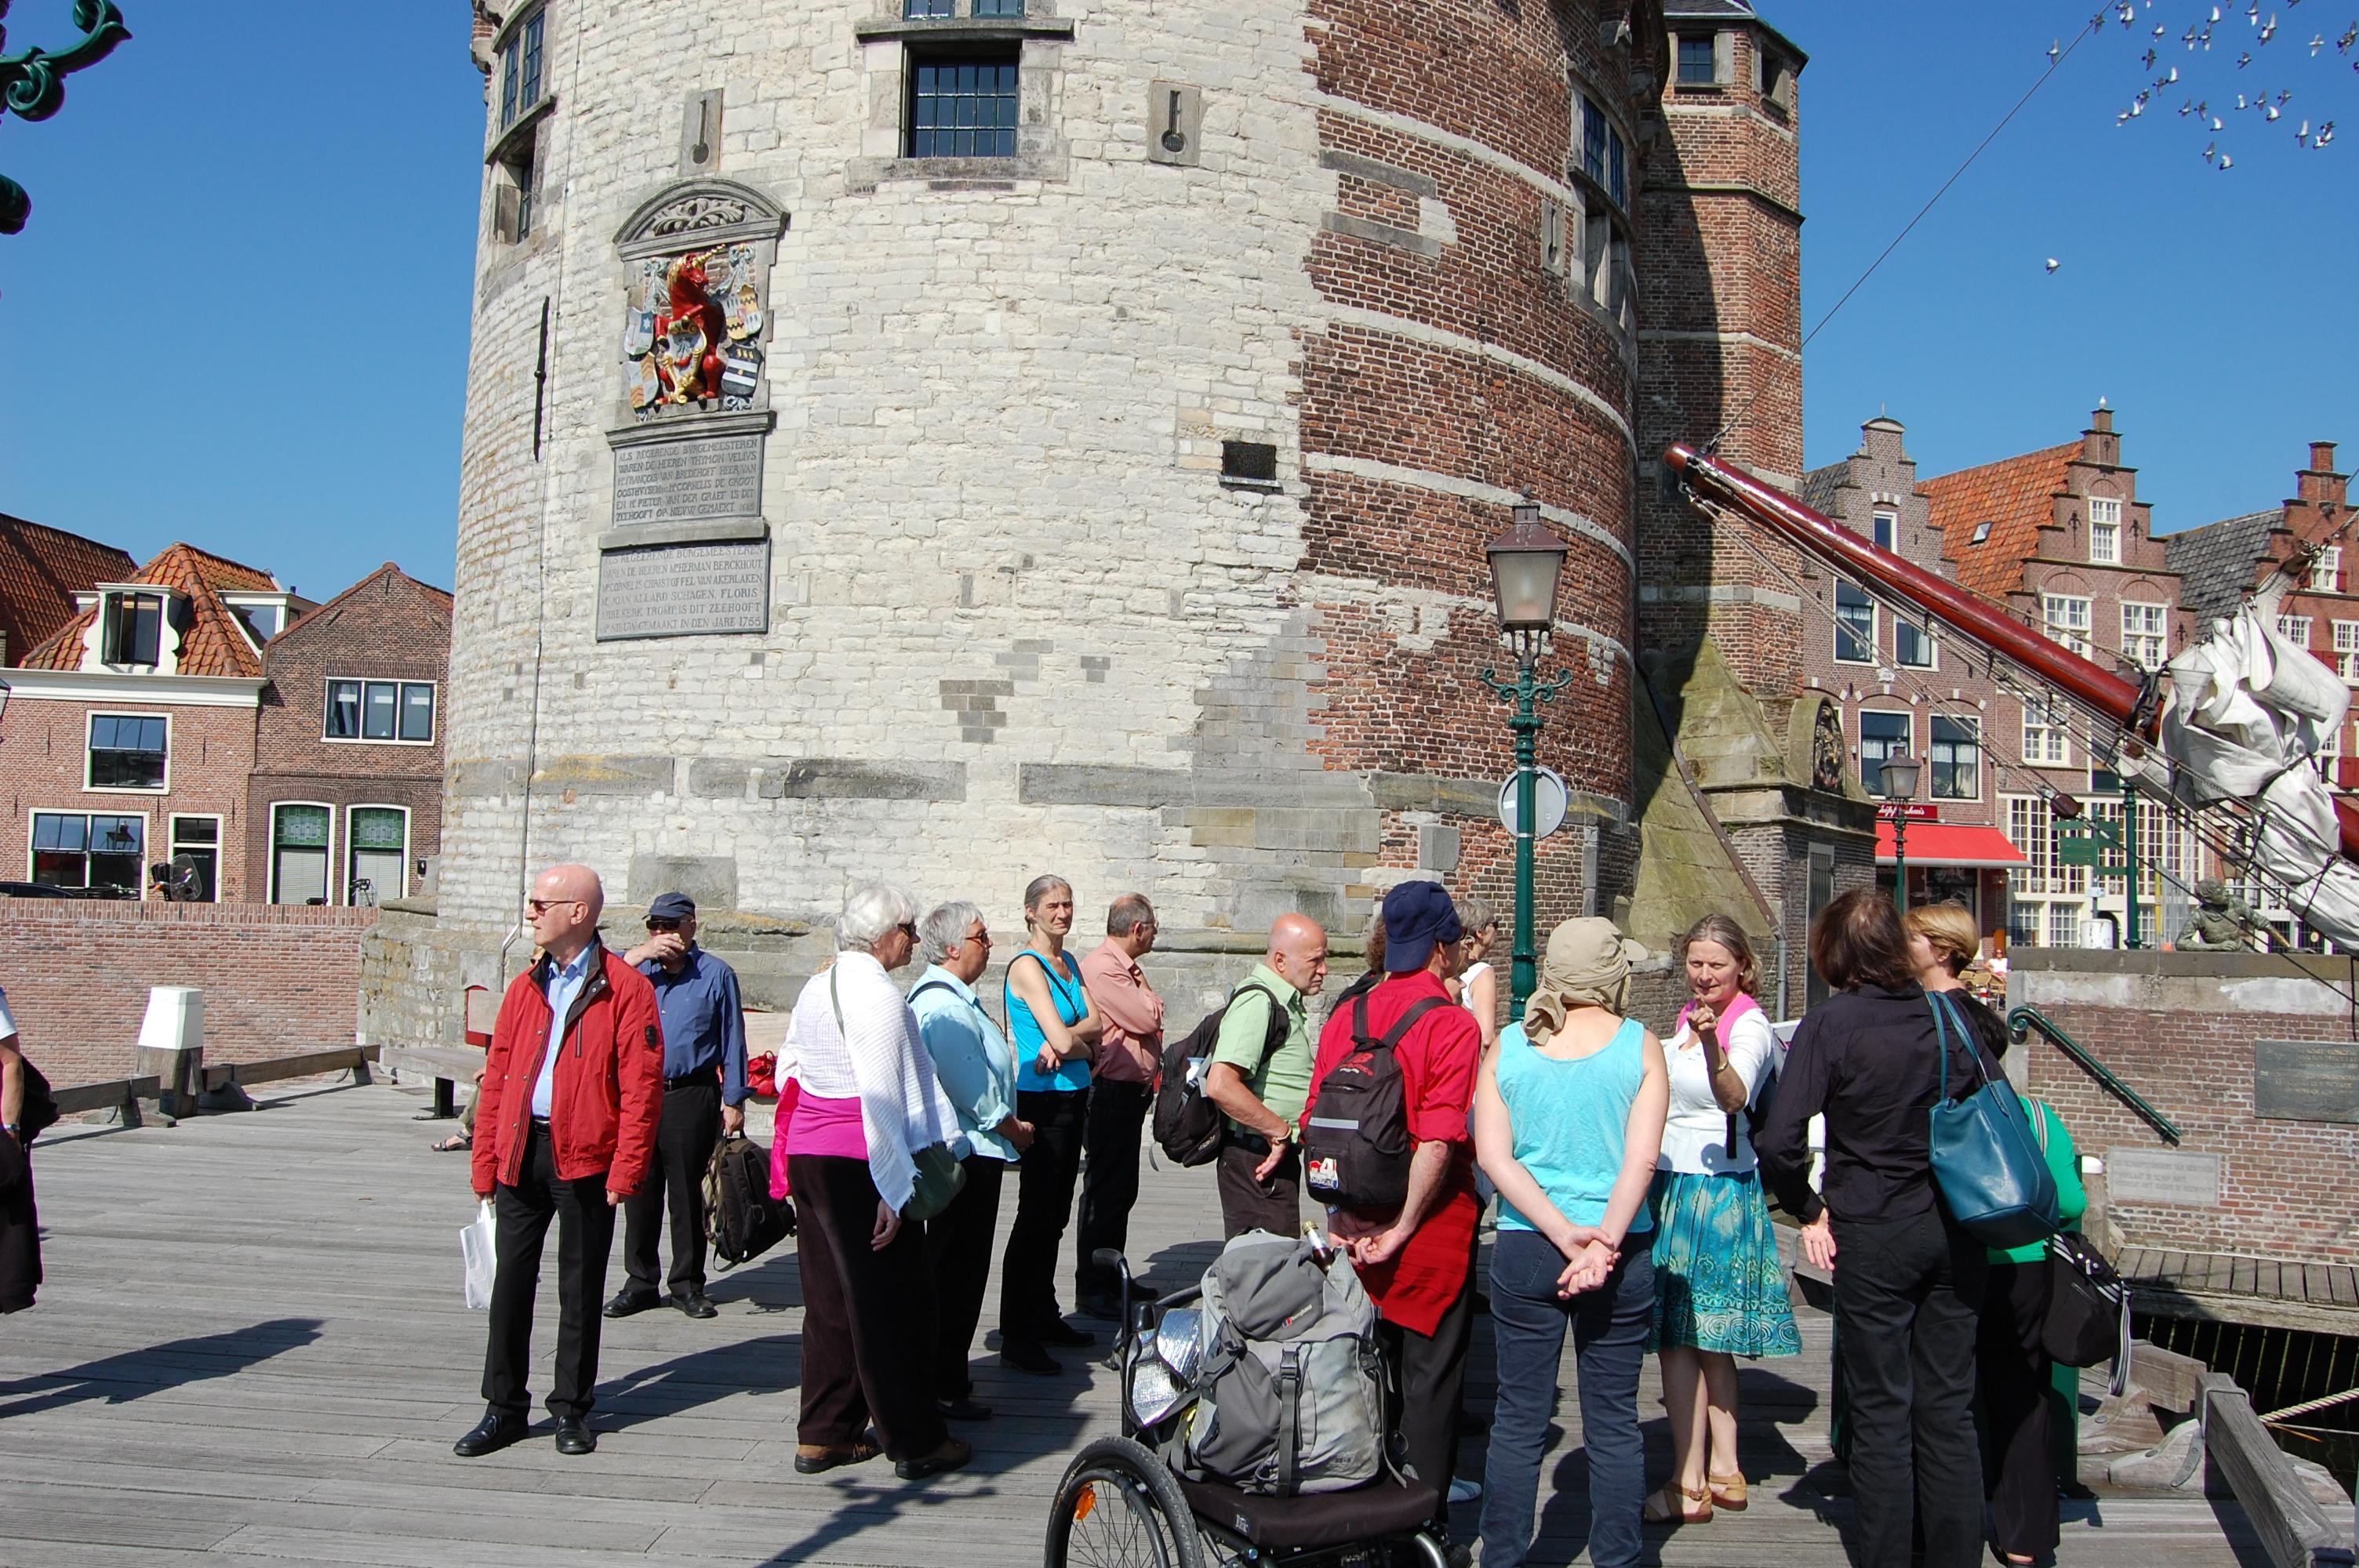 Stadswandeling in Hoorn